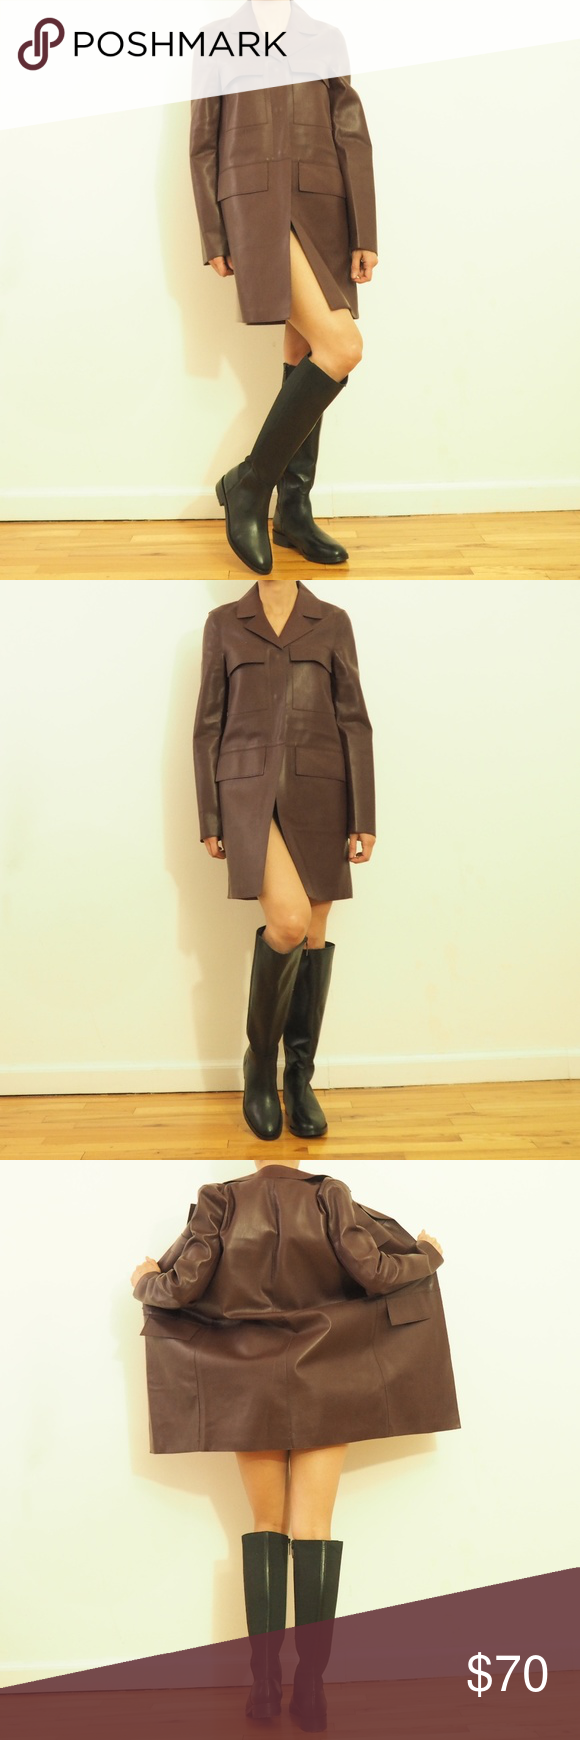 Zara burgundy coat Zara burgundy coat, Burgundy coats